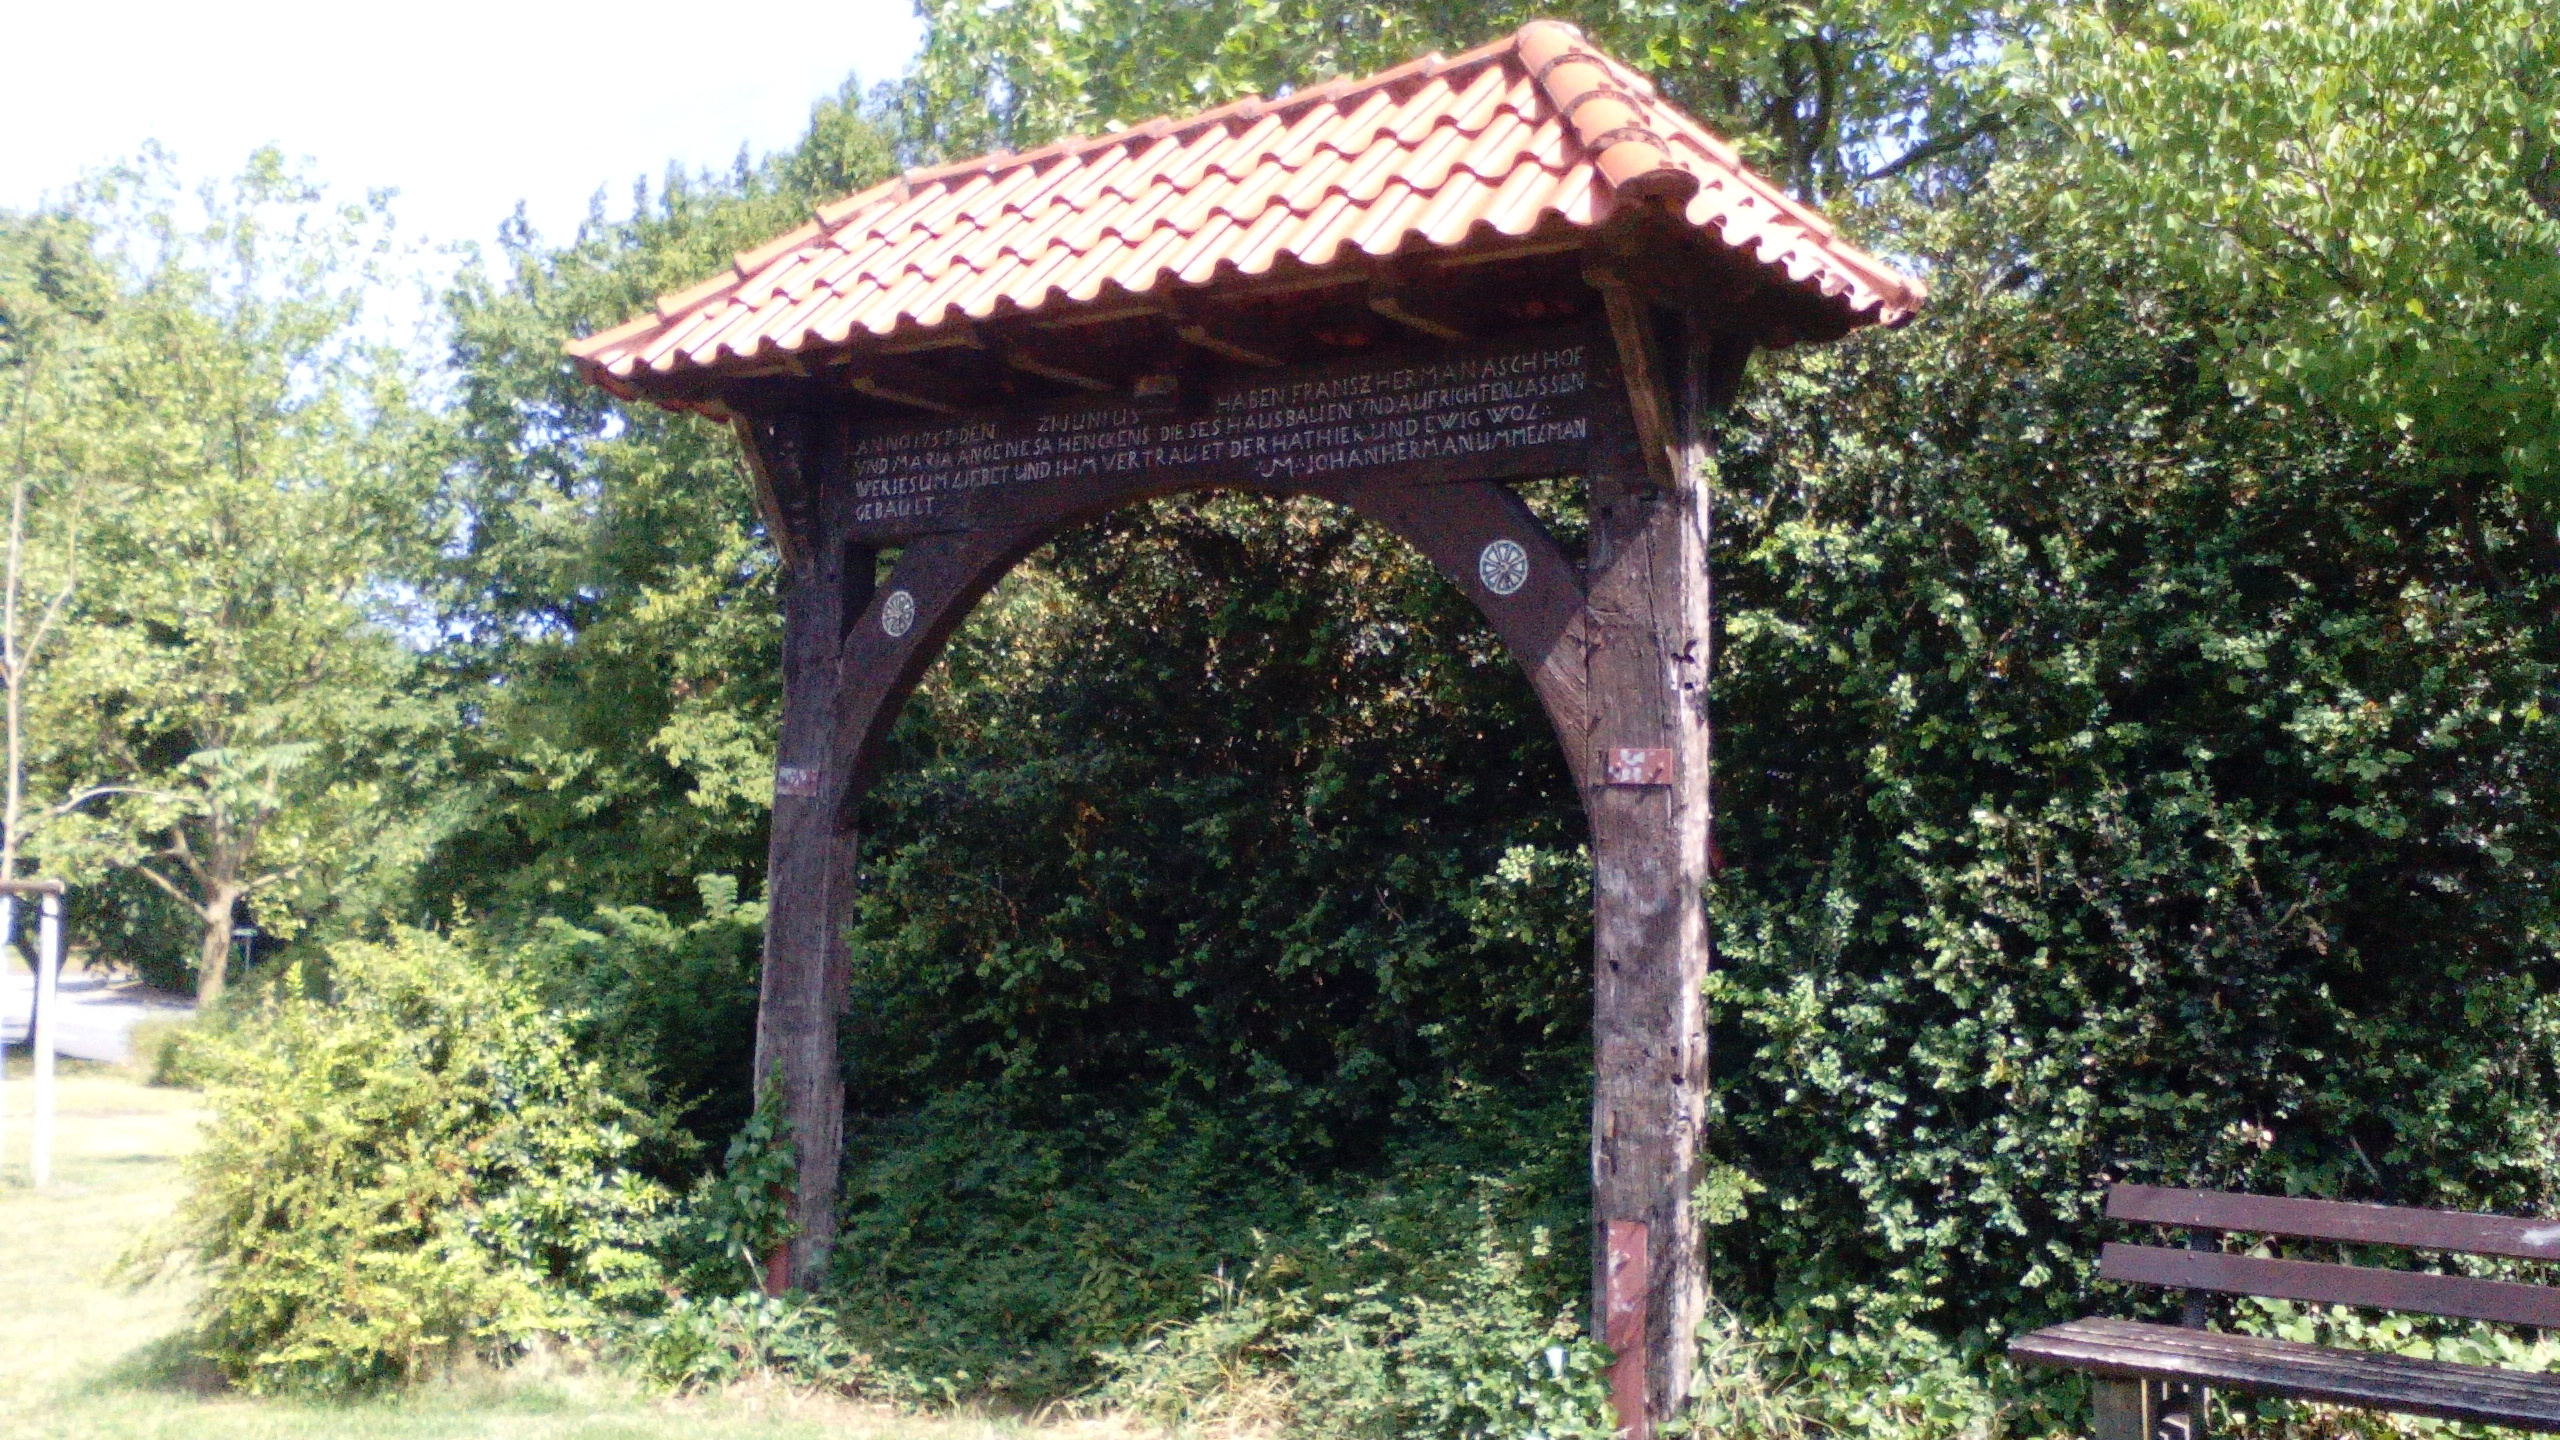 File:Alter Torbogen Bielefeld-Brackwede.jpg - Wikimedia Commons